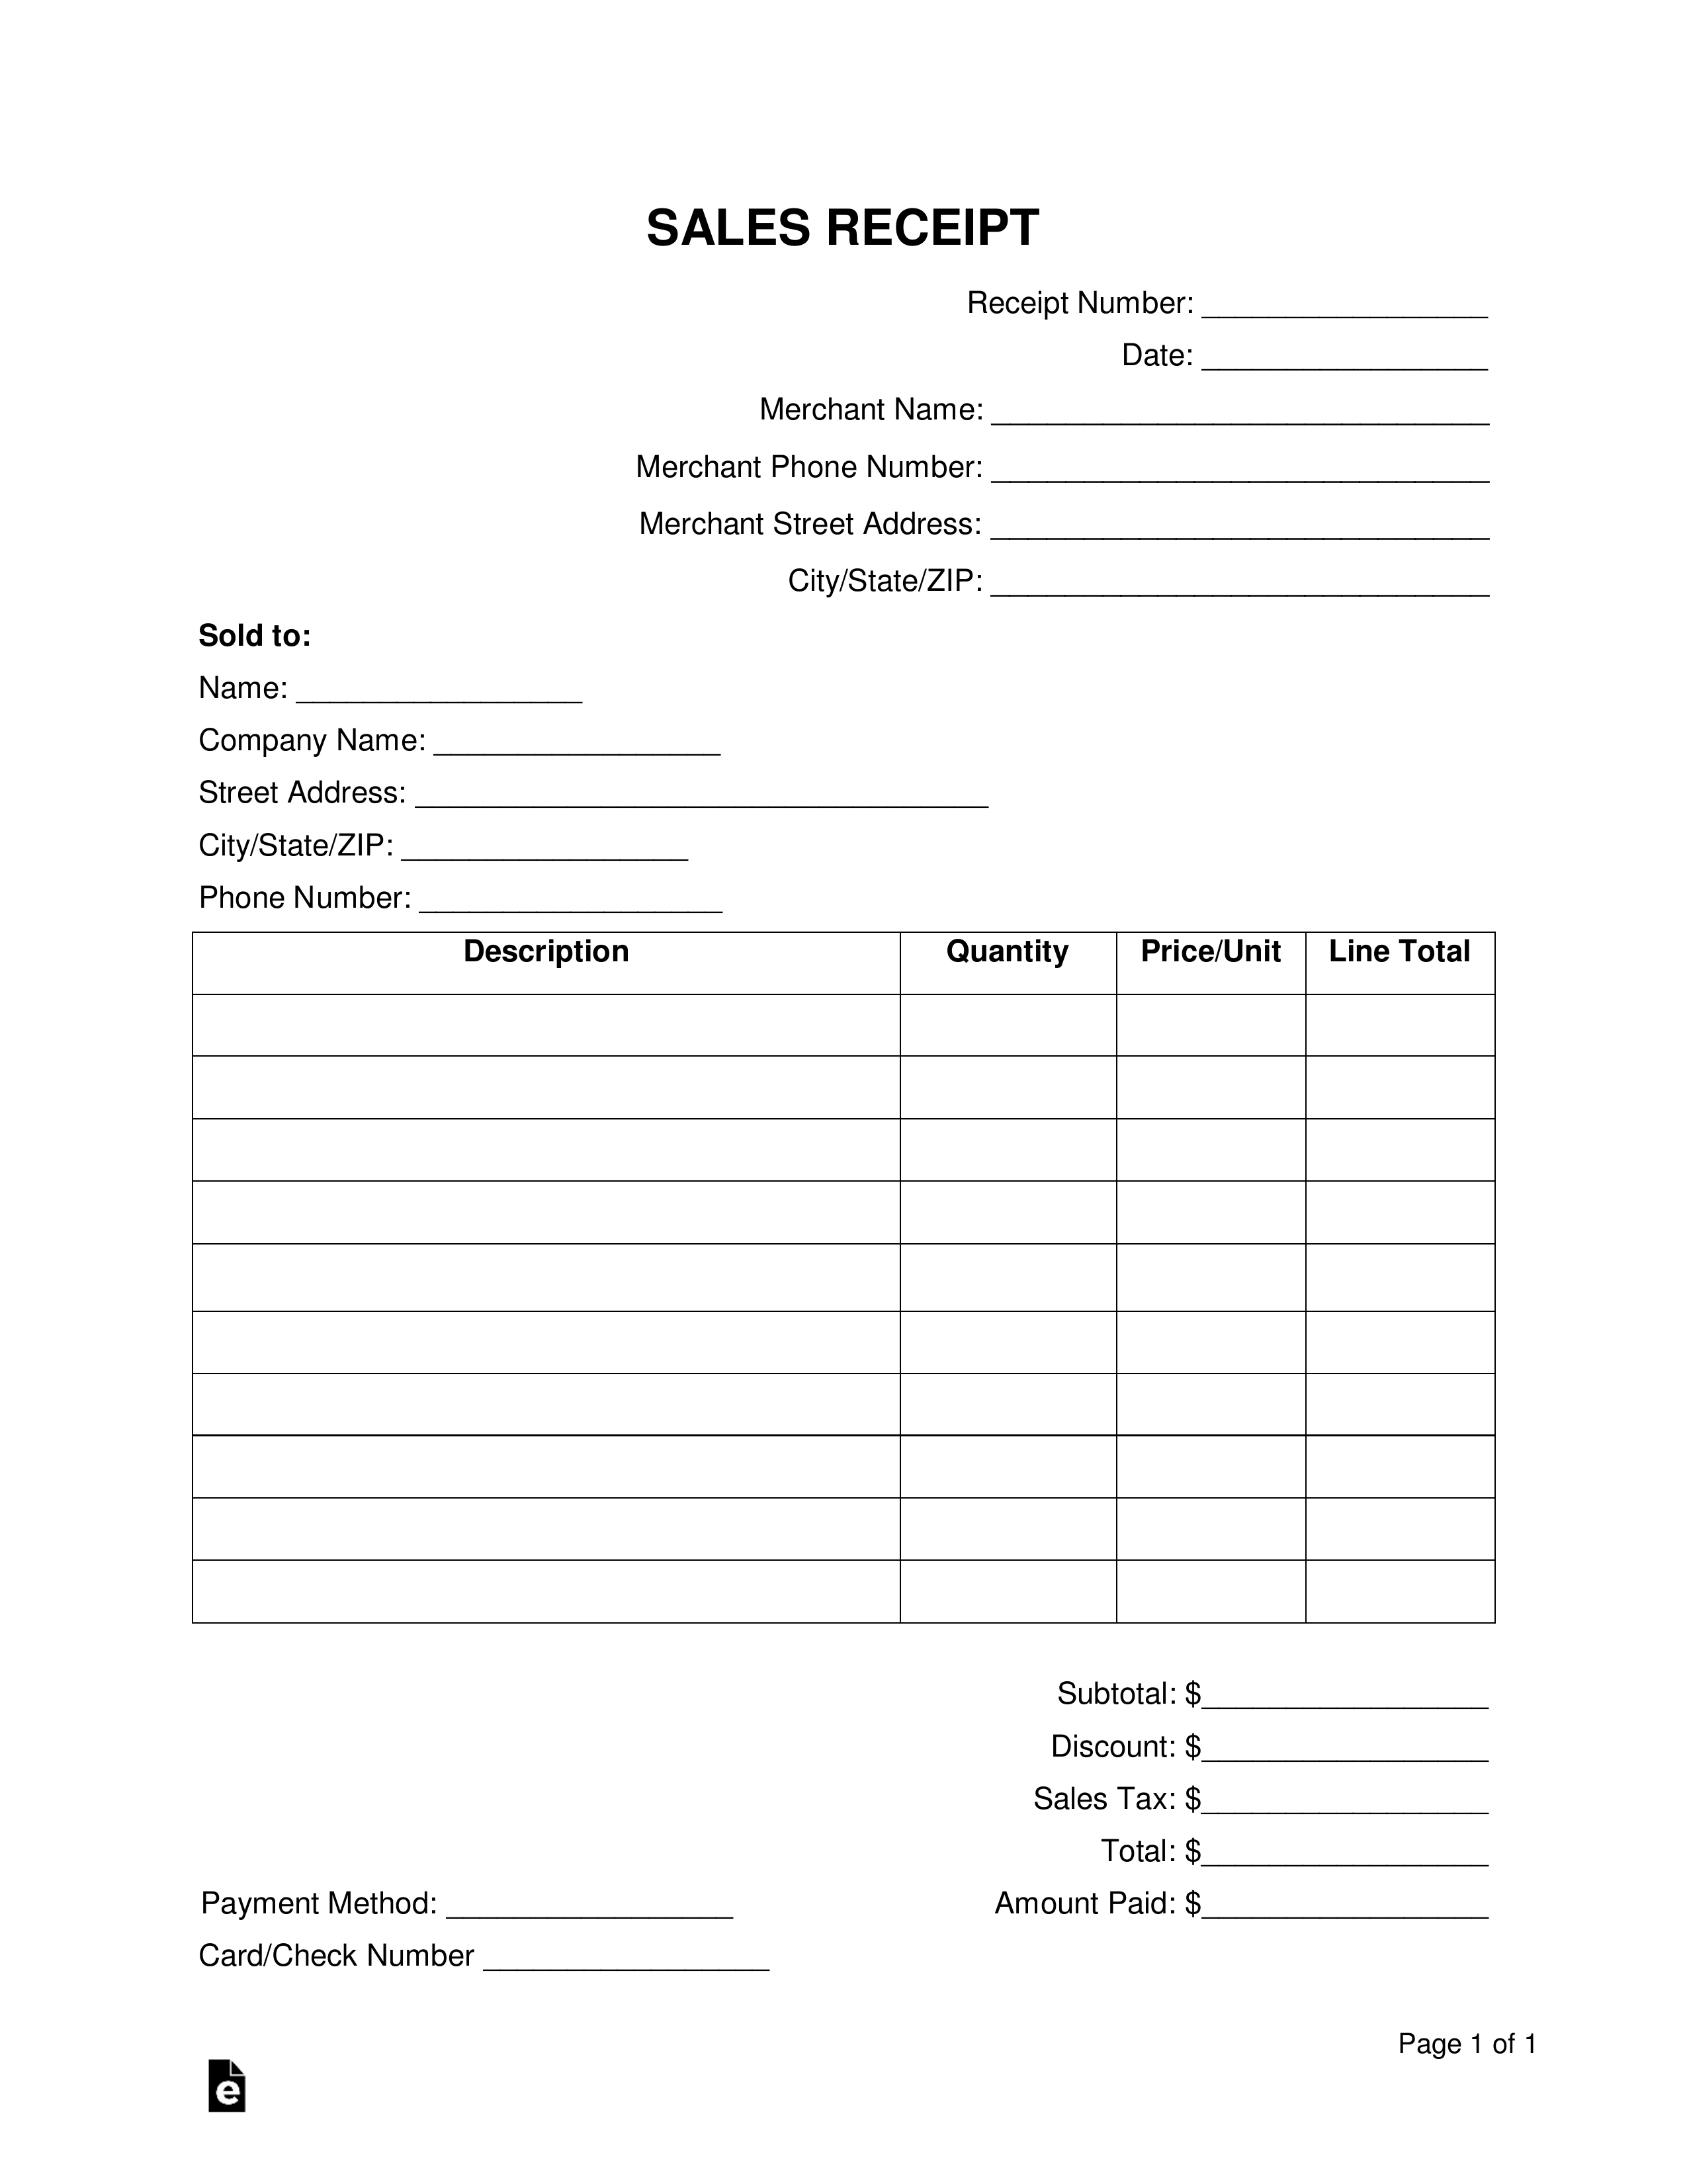 free sales receipt template word pdf eforms free sales receipt template microsoft word